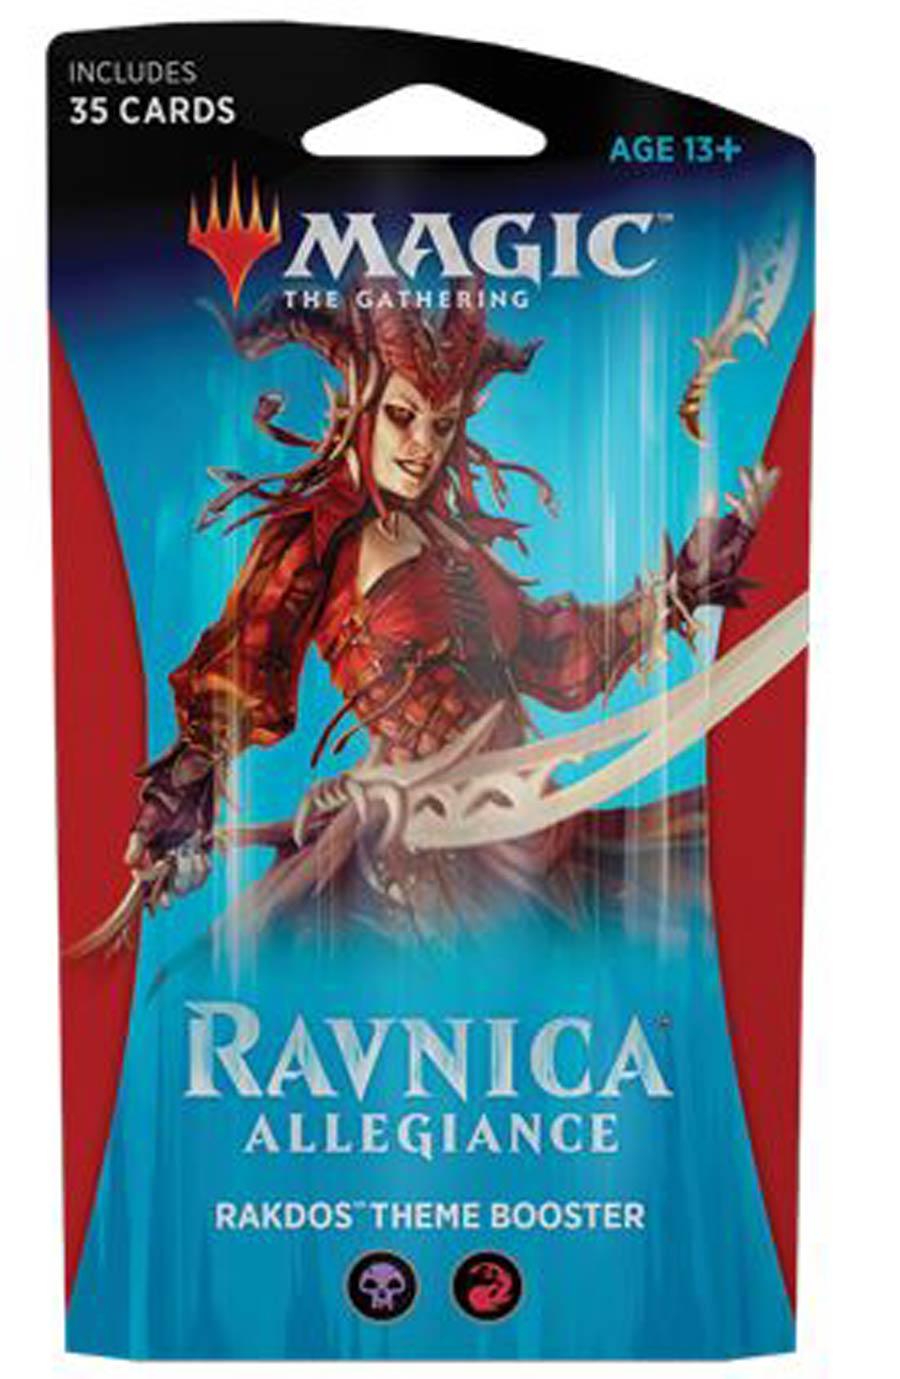 Magic The Gathering Ravnica Allegiance Theme Booster Pack - Rakdos